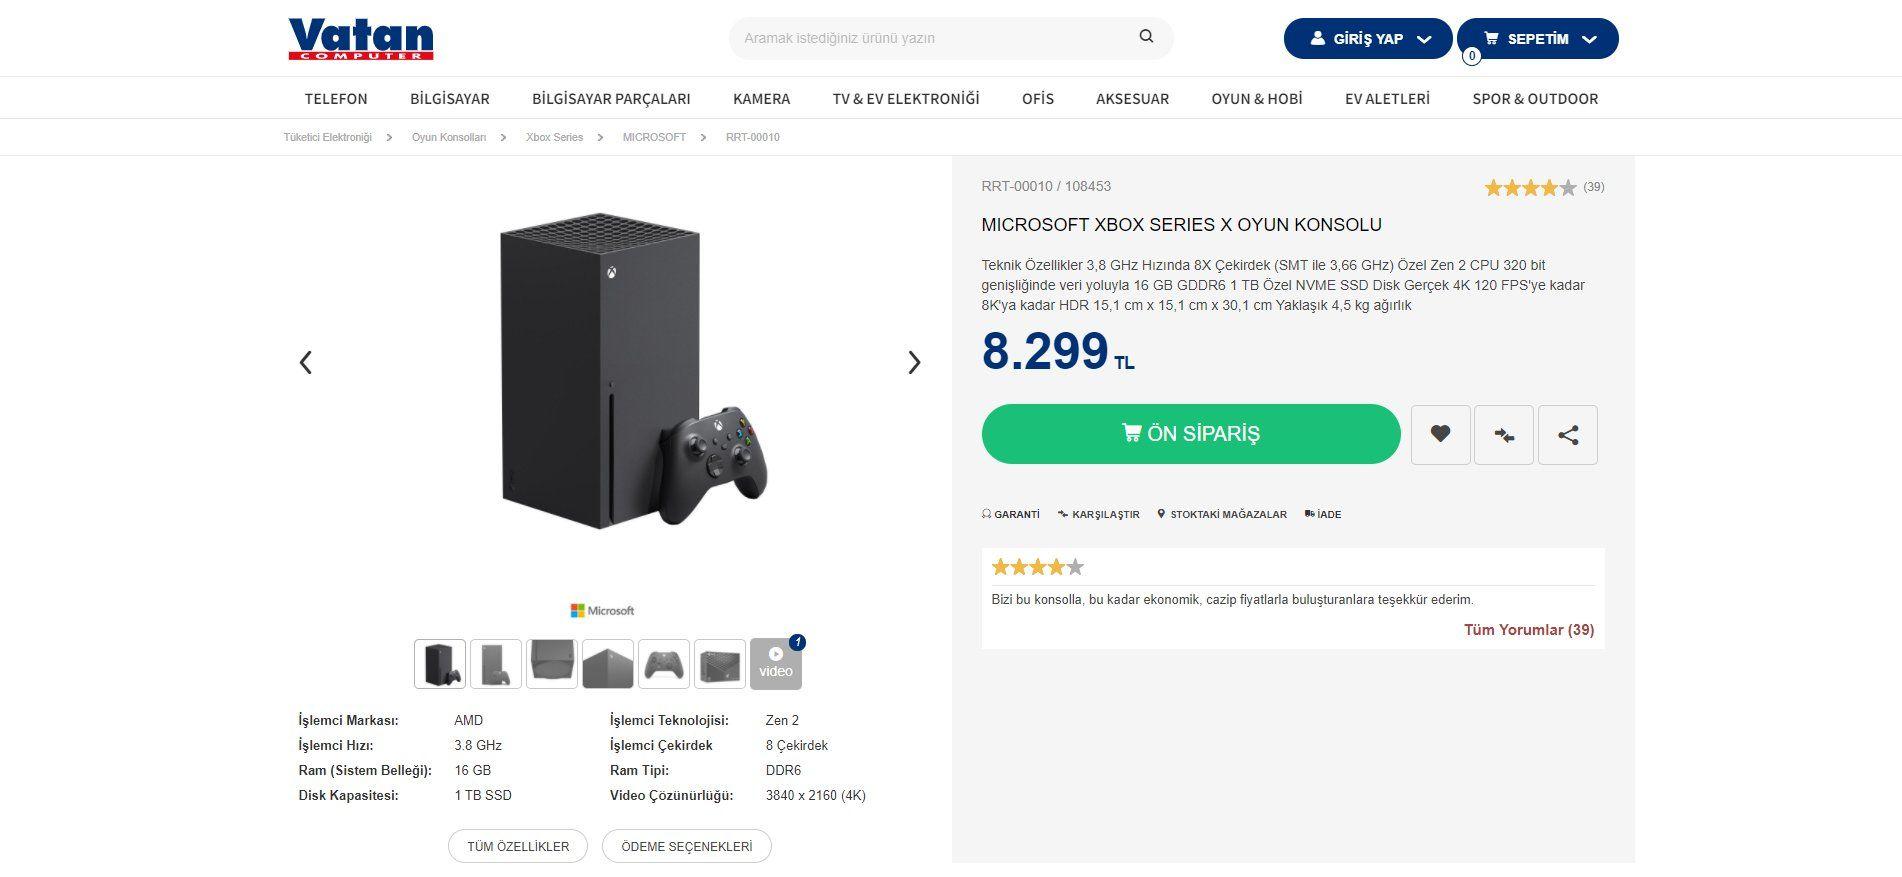 Xbox Series X Türkiye fiyatı düştü